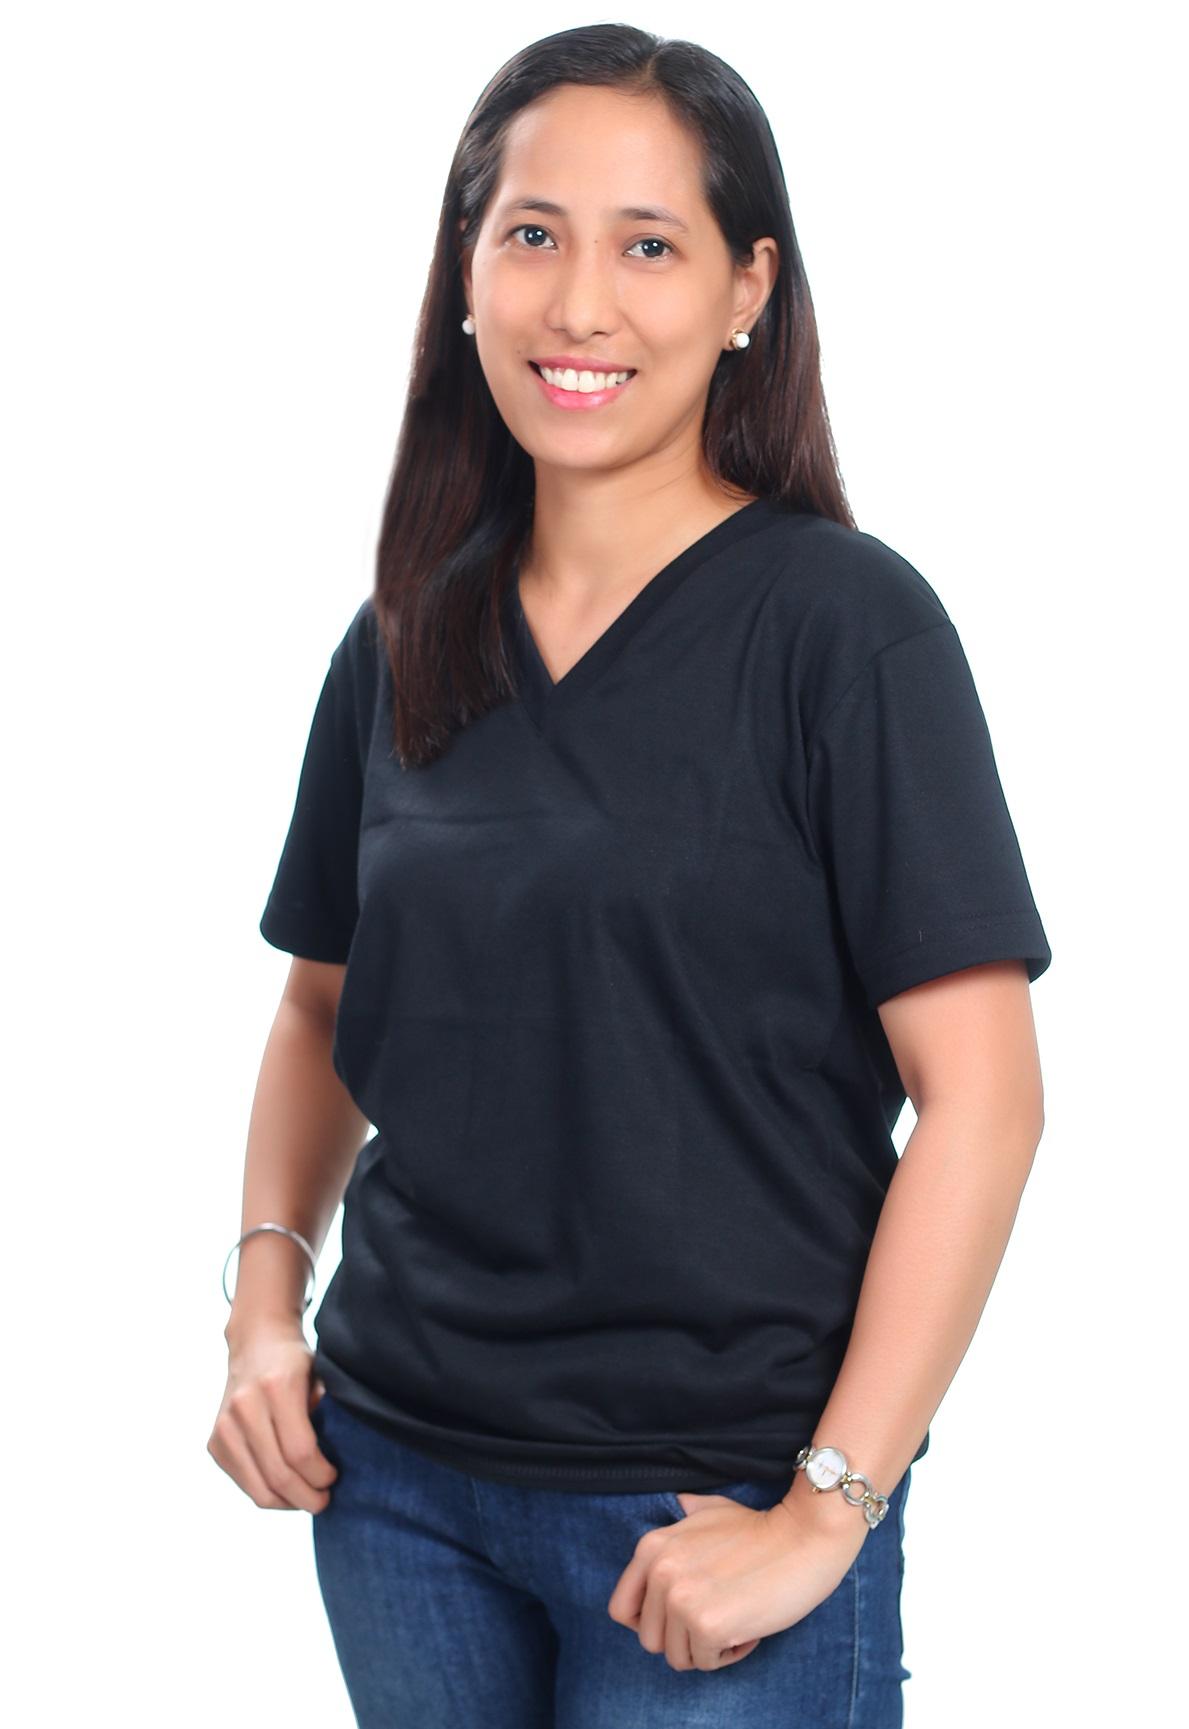 Carolyn Miciano Virtual Assistant